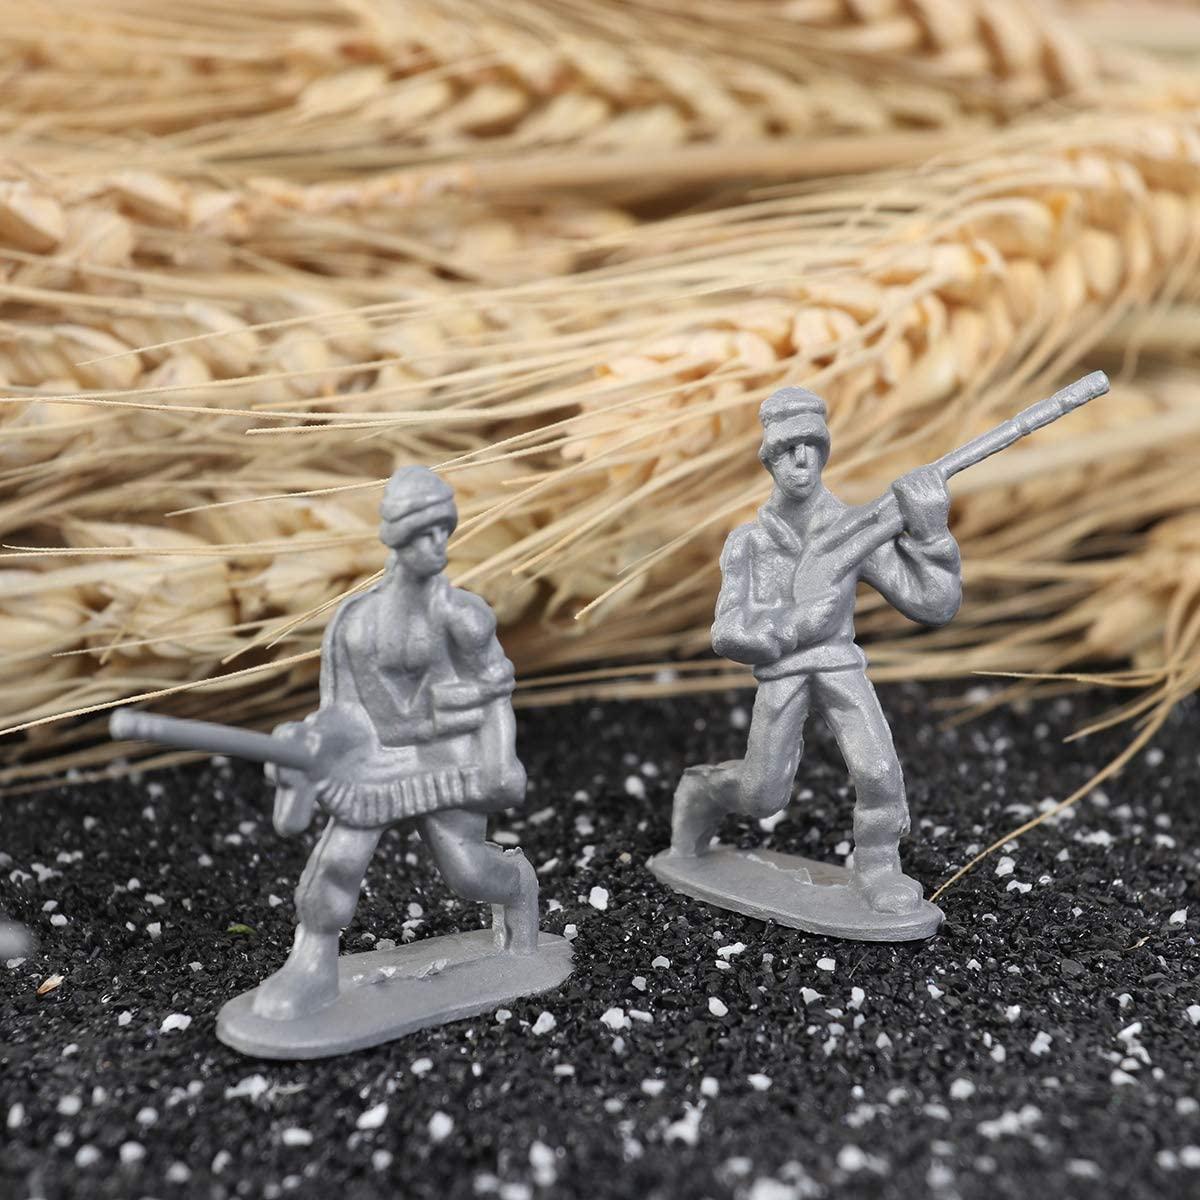 TOYANDONA 100pcs Soldiers Figures Static Plastic Military Army Men Model Party Favor Figures Play Set Accessories for Kids(Random Color)